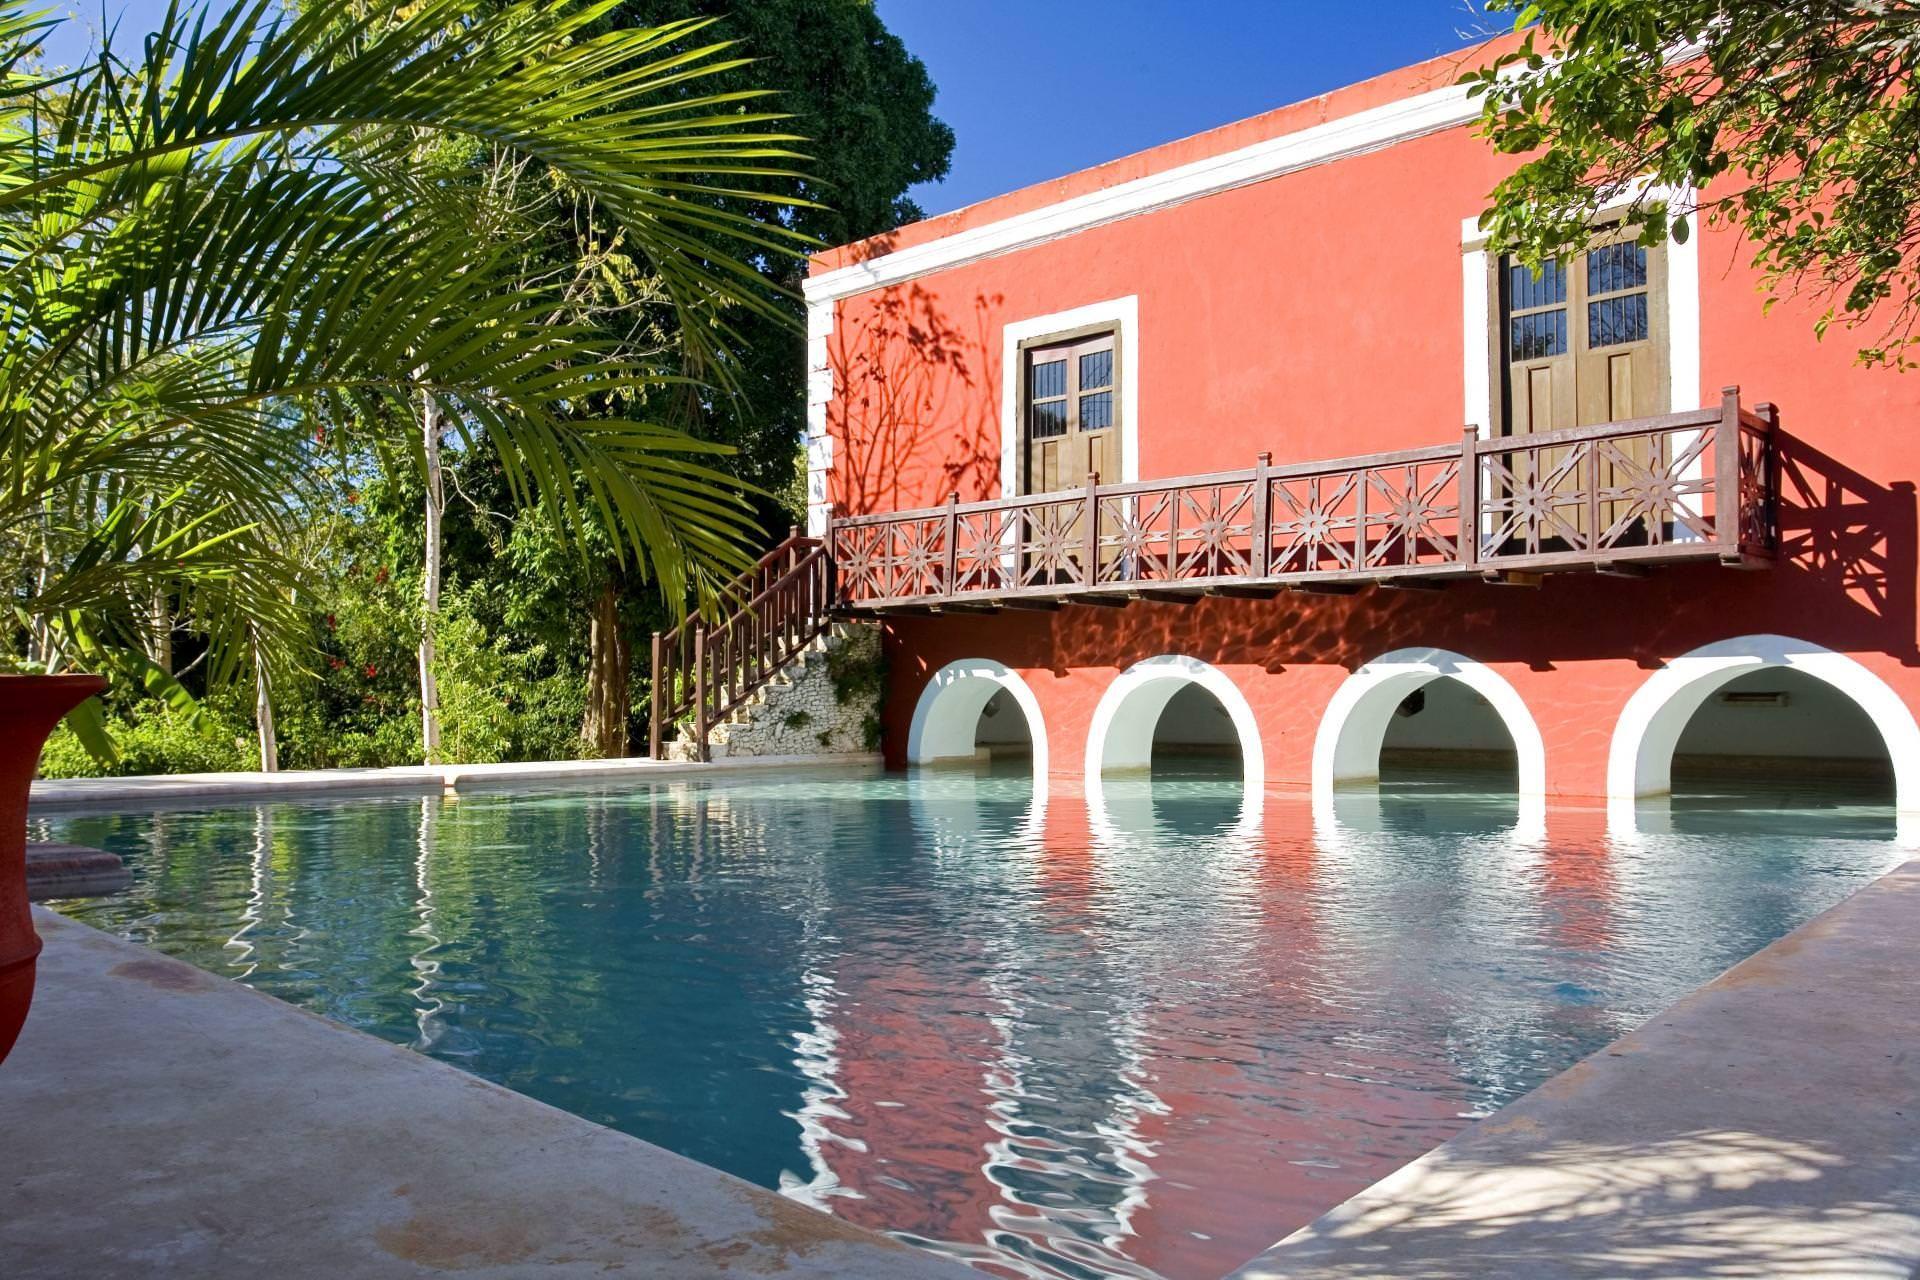 Piscina del hotel hacienda Santa Rosa en Merida Peninsula de